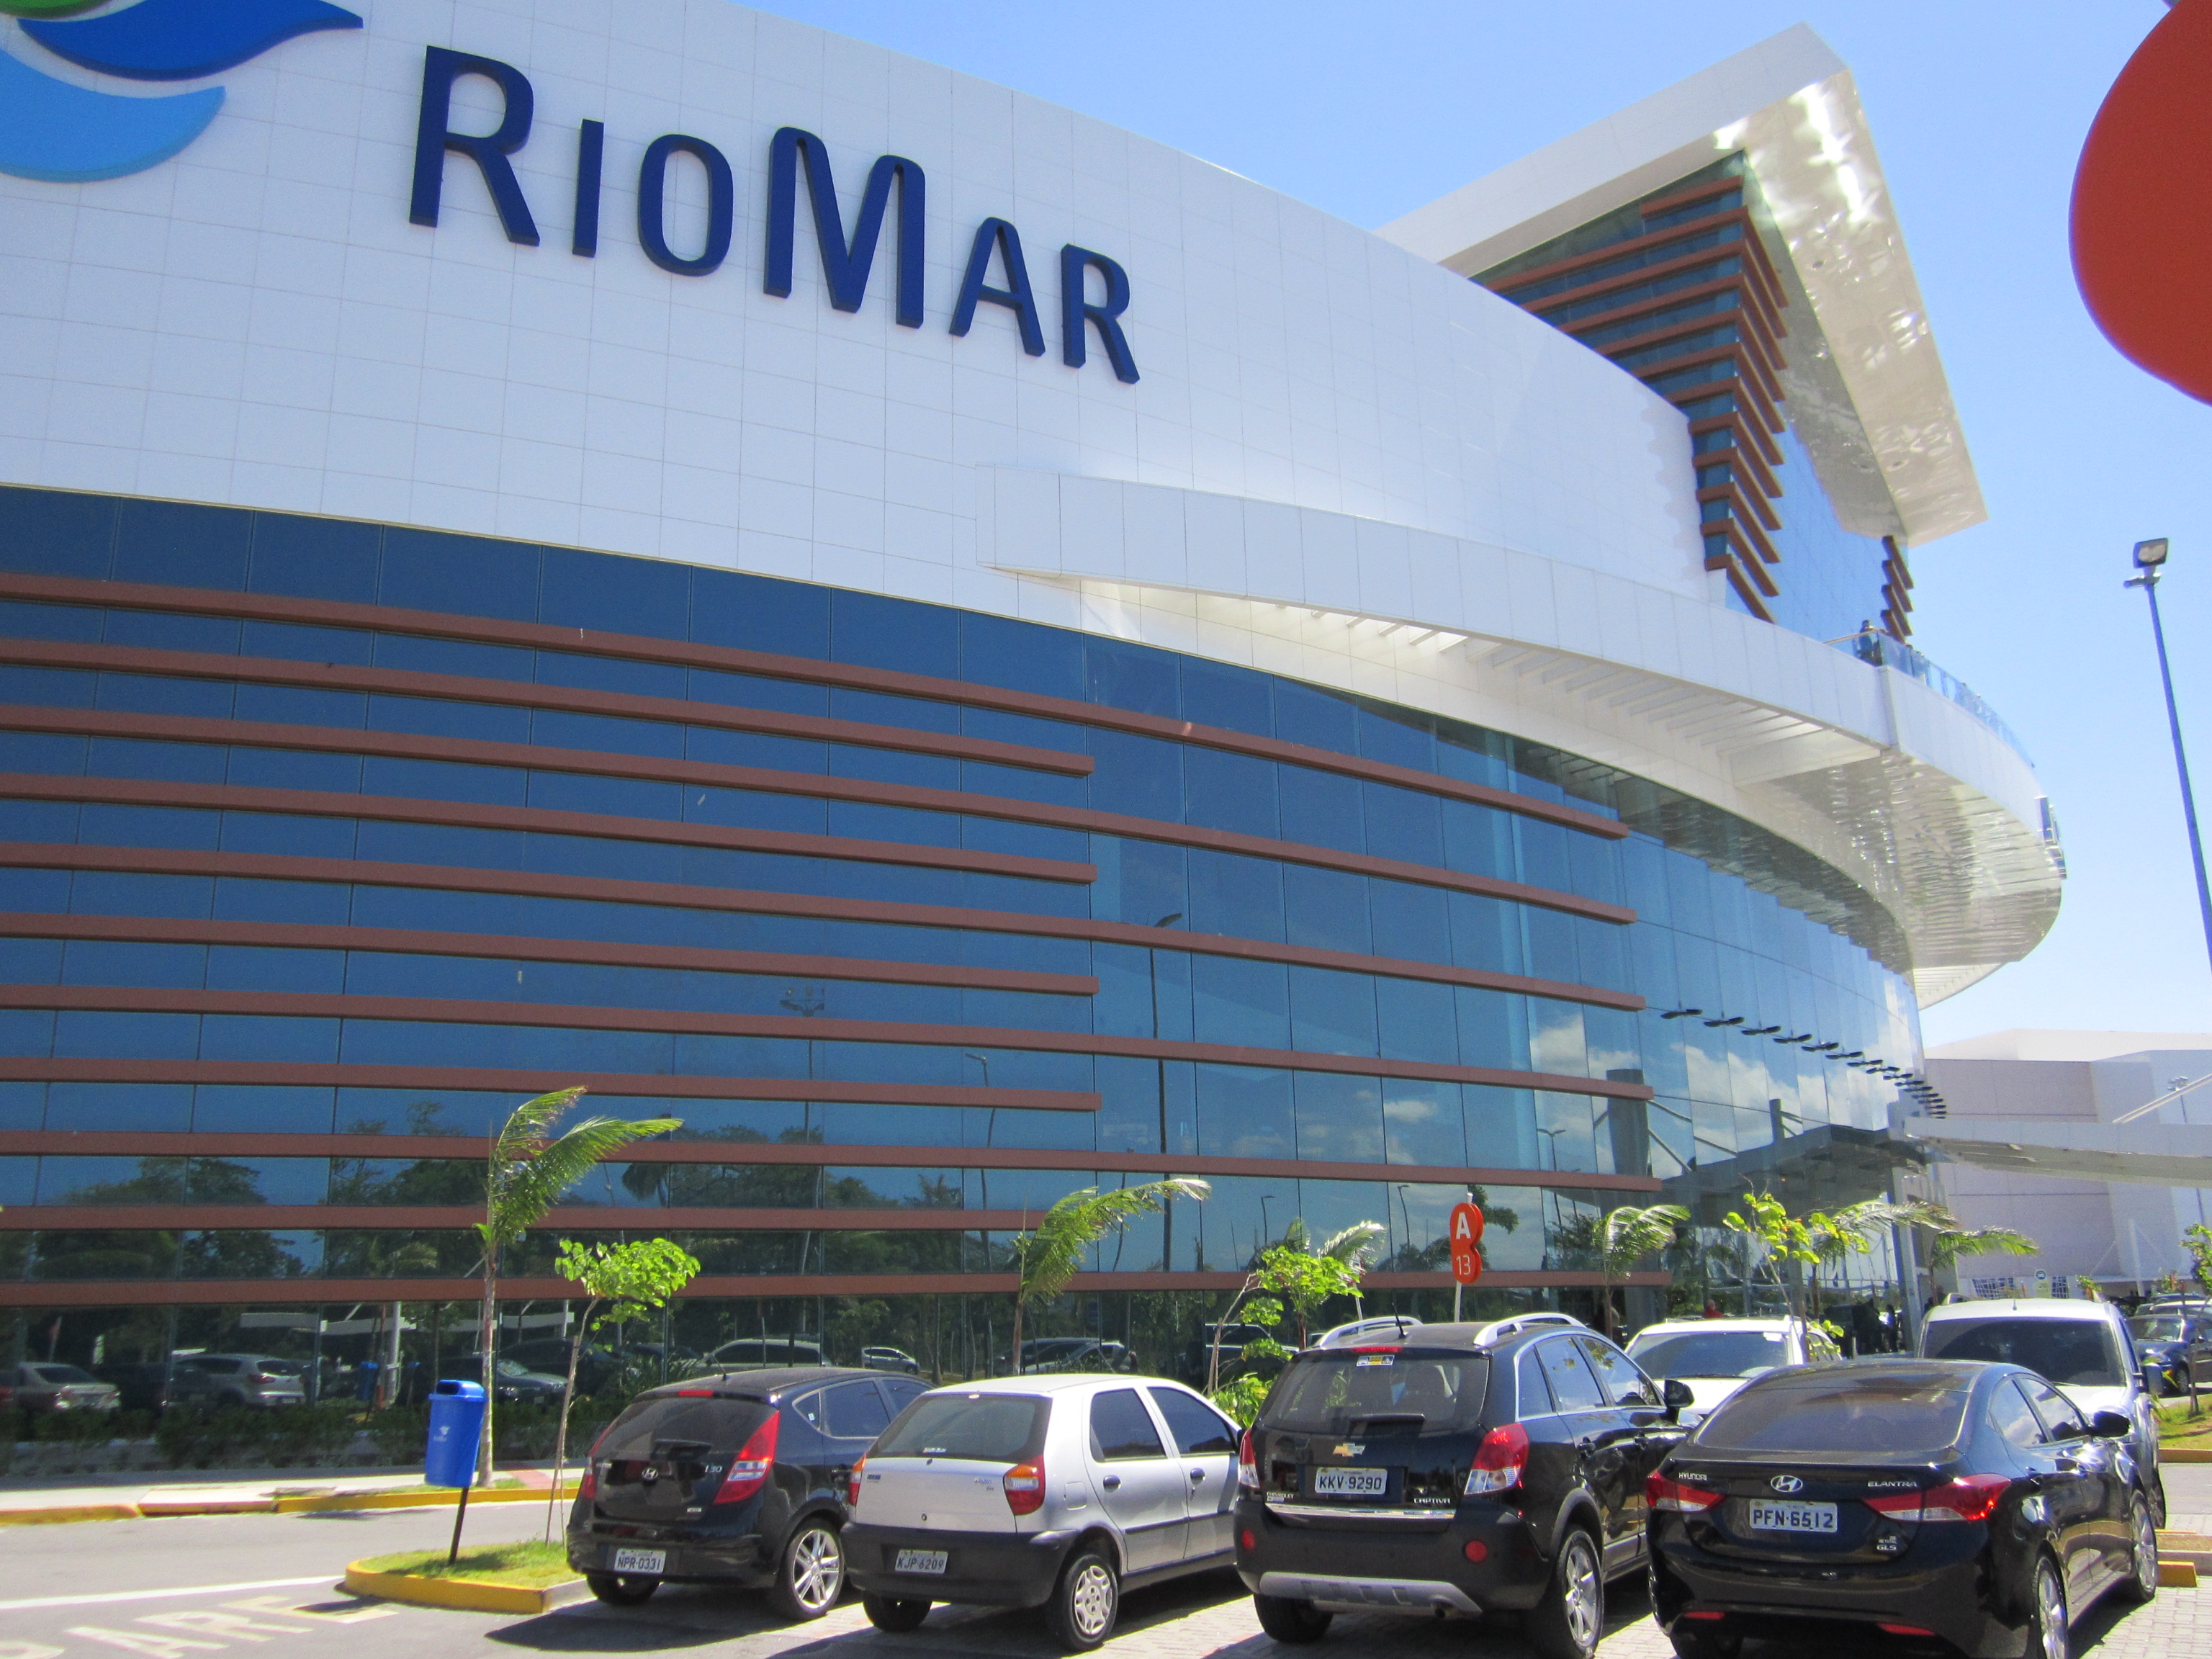 https://upload.wikimedia.org/wikipedia/commons/0/01/RioMar_Shopping_-_Recife%2C_Pernambuco%2C_Brasil.jpg